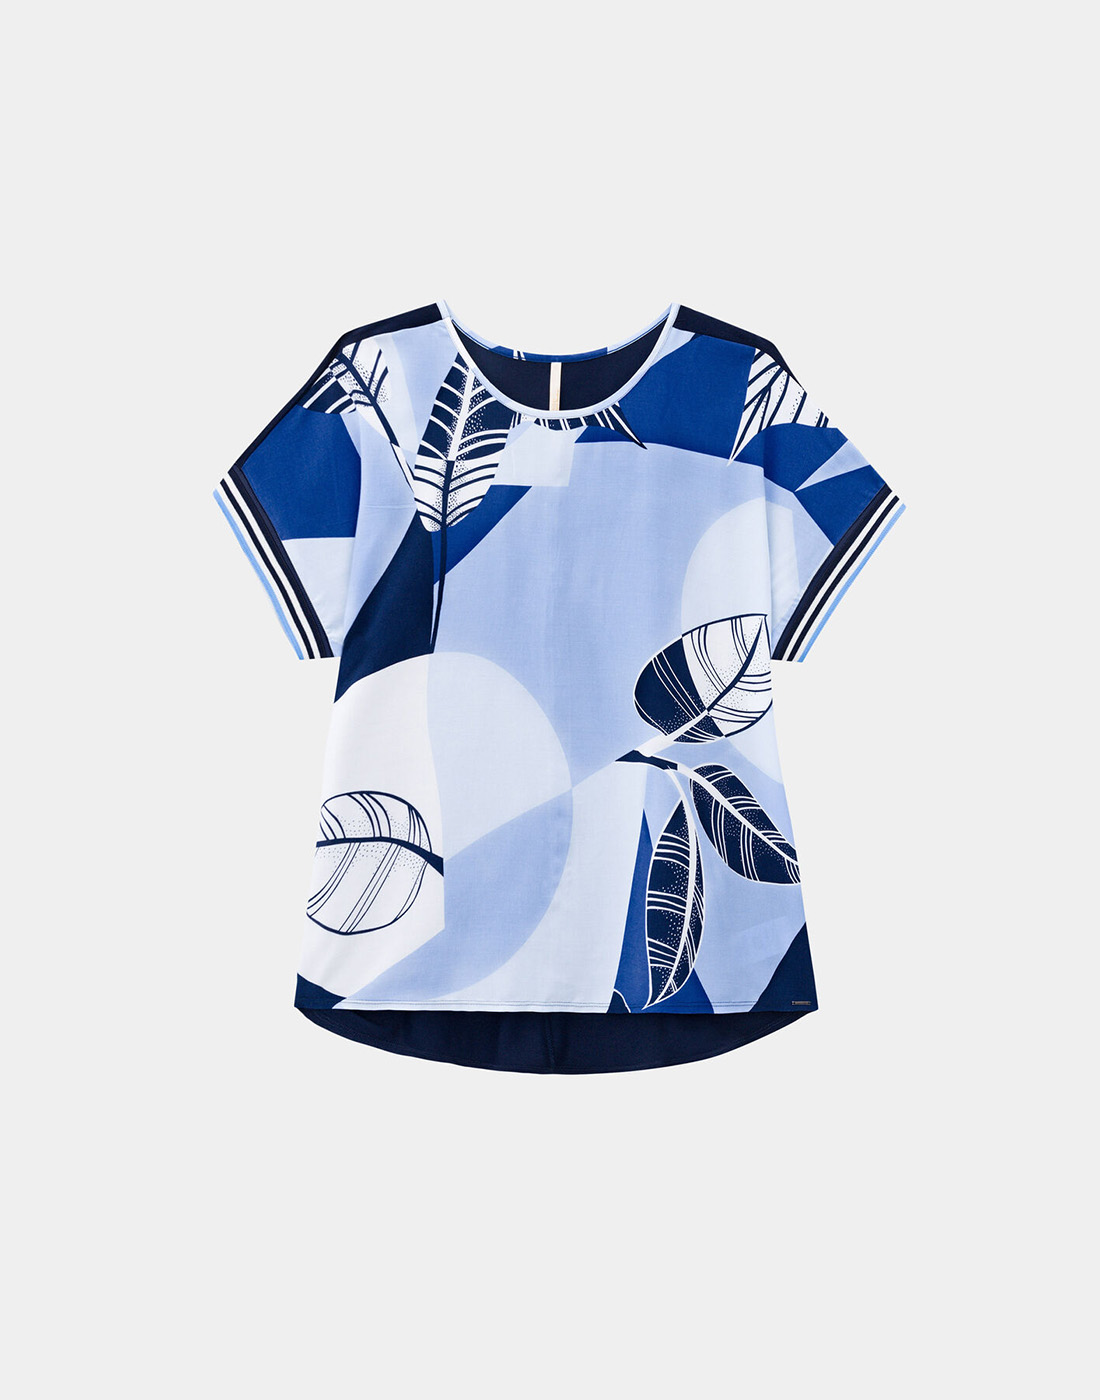 Blusa Mullet Plus Size Tecido Rayon e Malha Viscose Marinho Soft Navy Lunender Mais Mulher